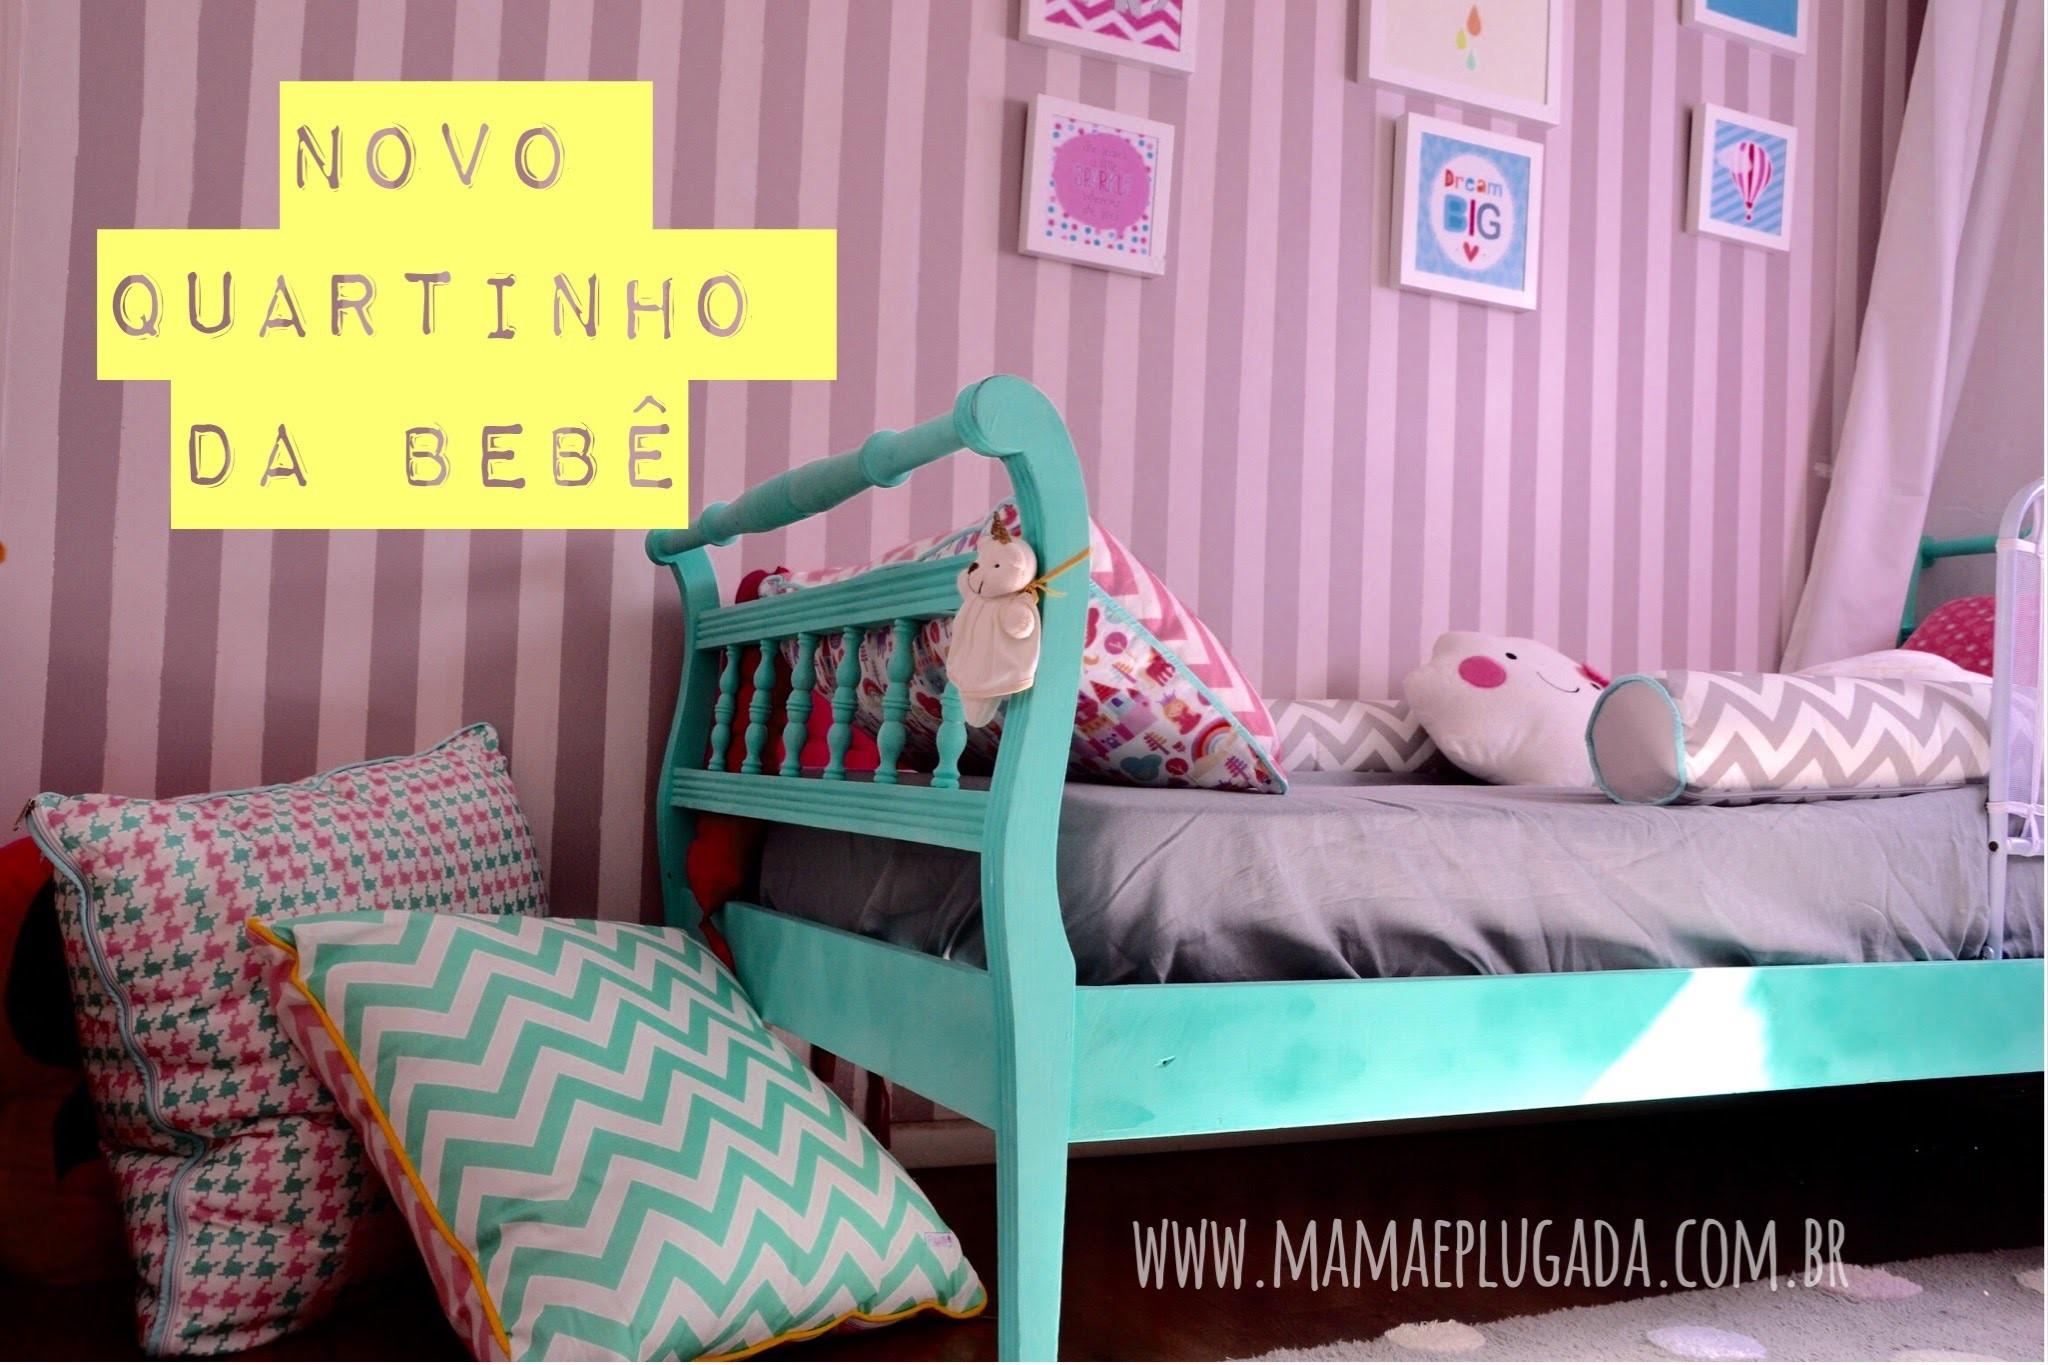 Decor Quarto Bebê - Children's Room Project